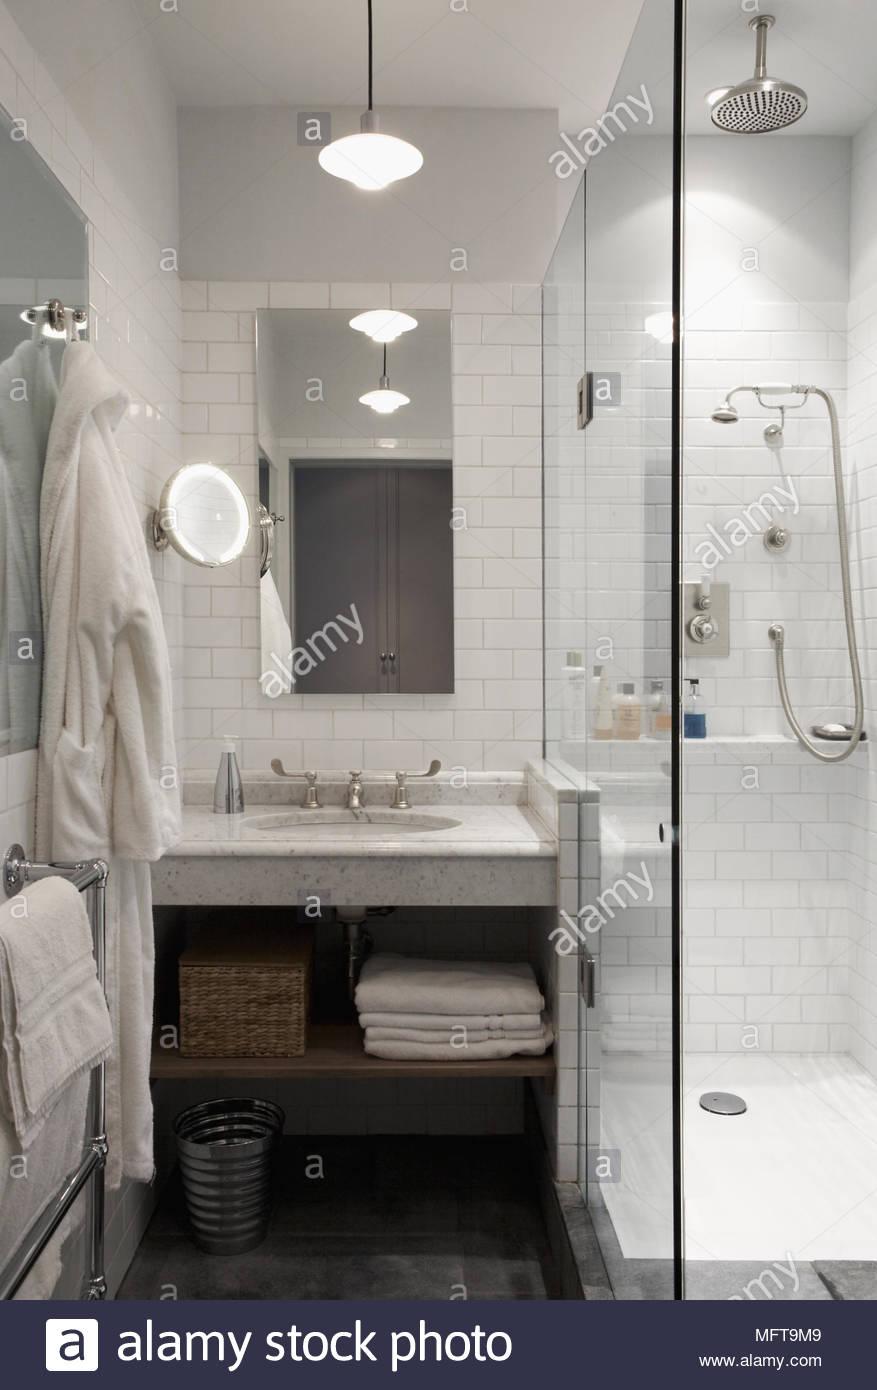 Washbasin set in granite shelf next to shower unit with glass screen ...